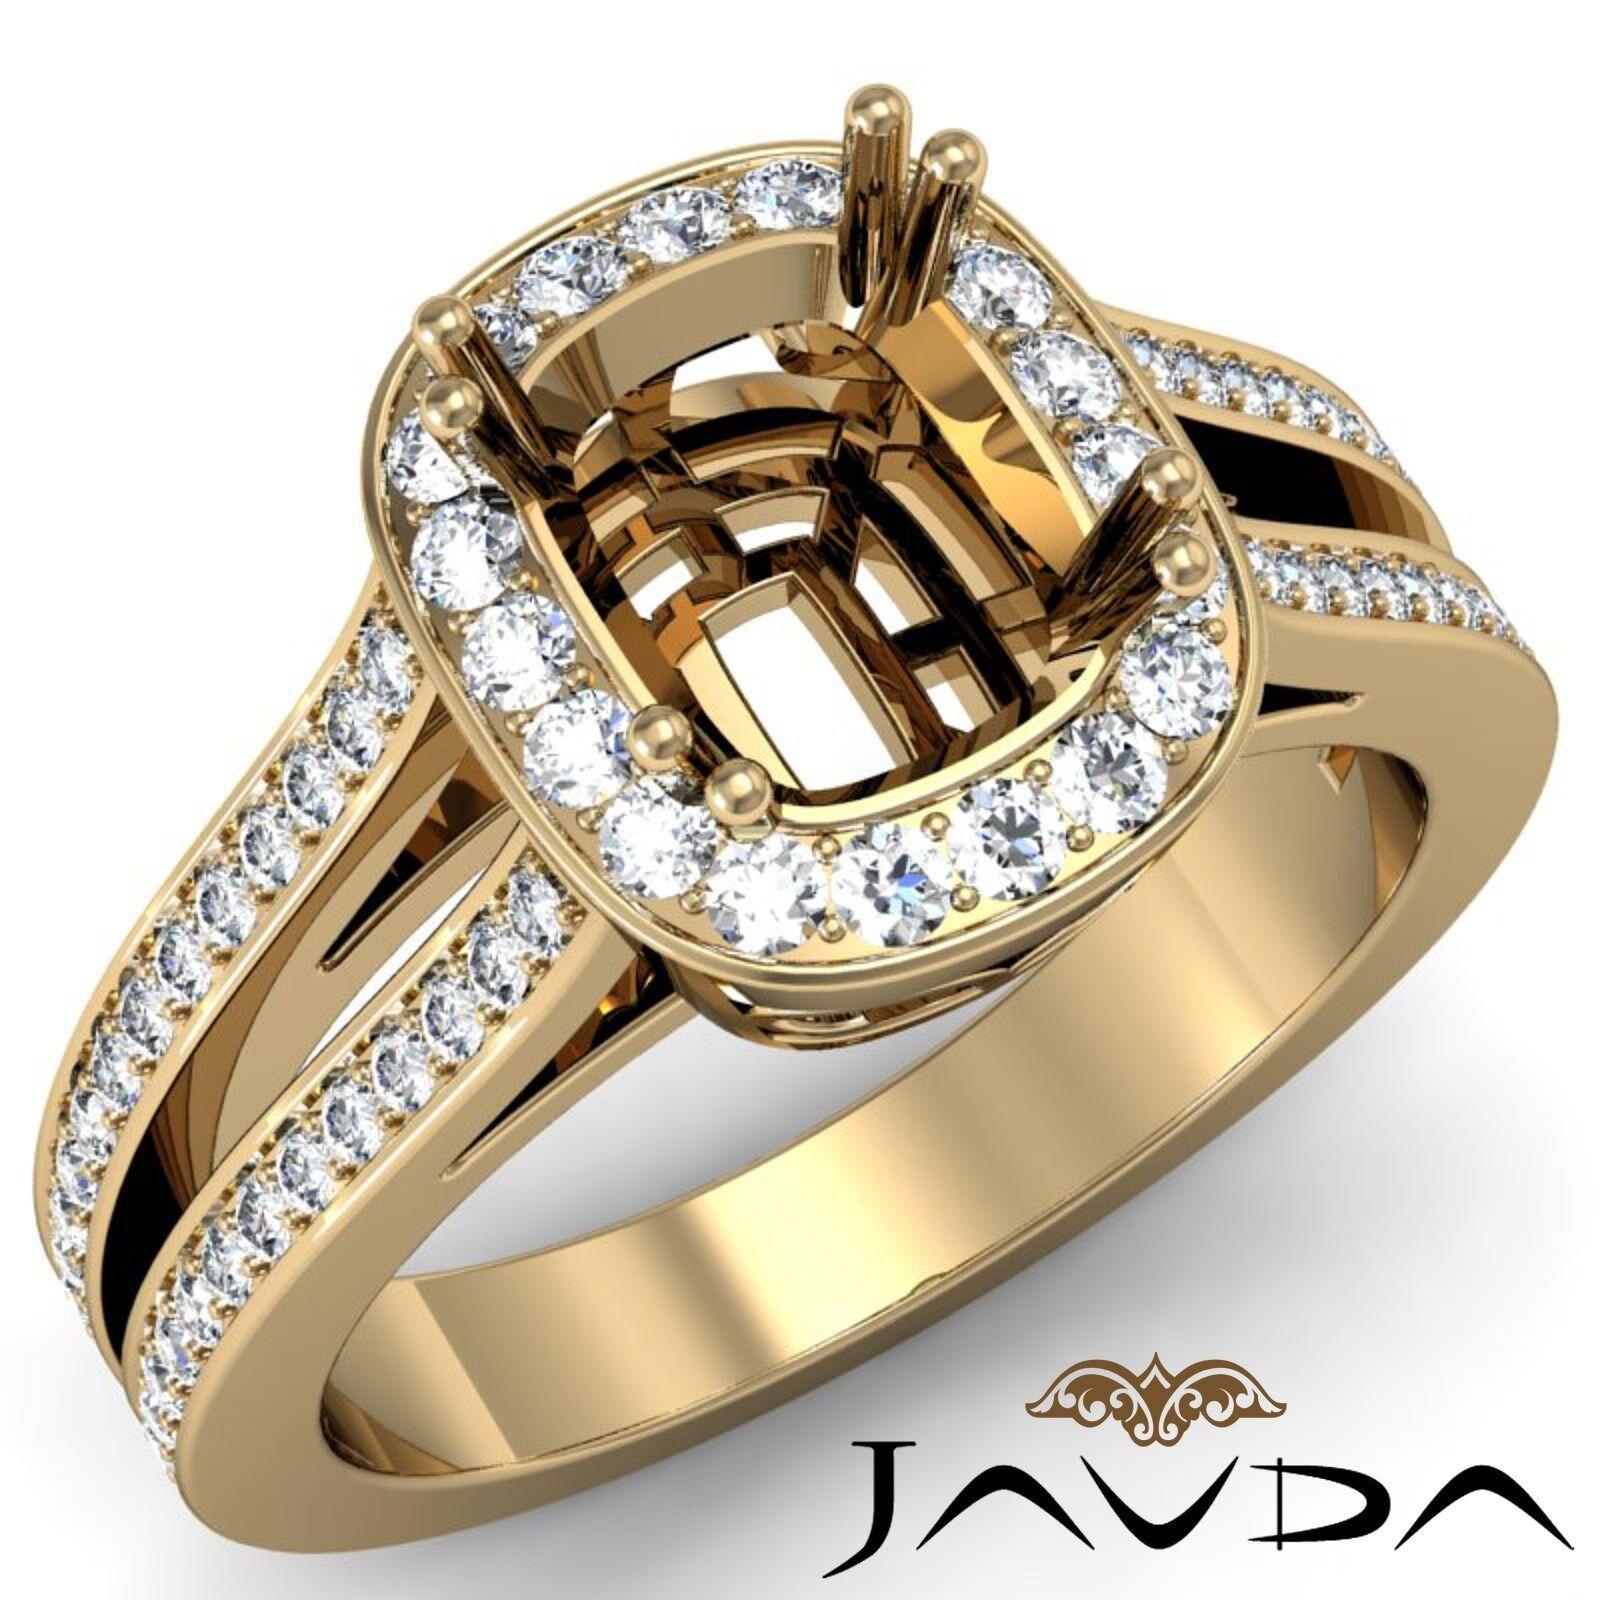 0.86Ct Cushion Diamond Engagement Ring 18k Yellow gold Halo Setting Semi Mount